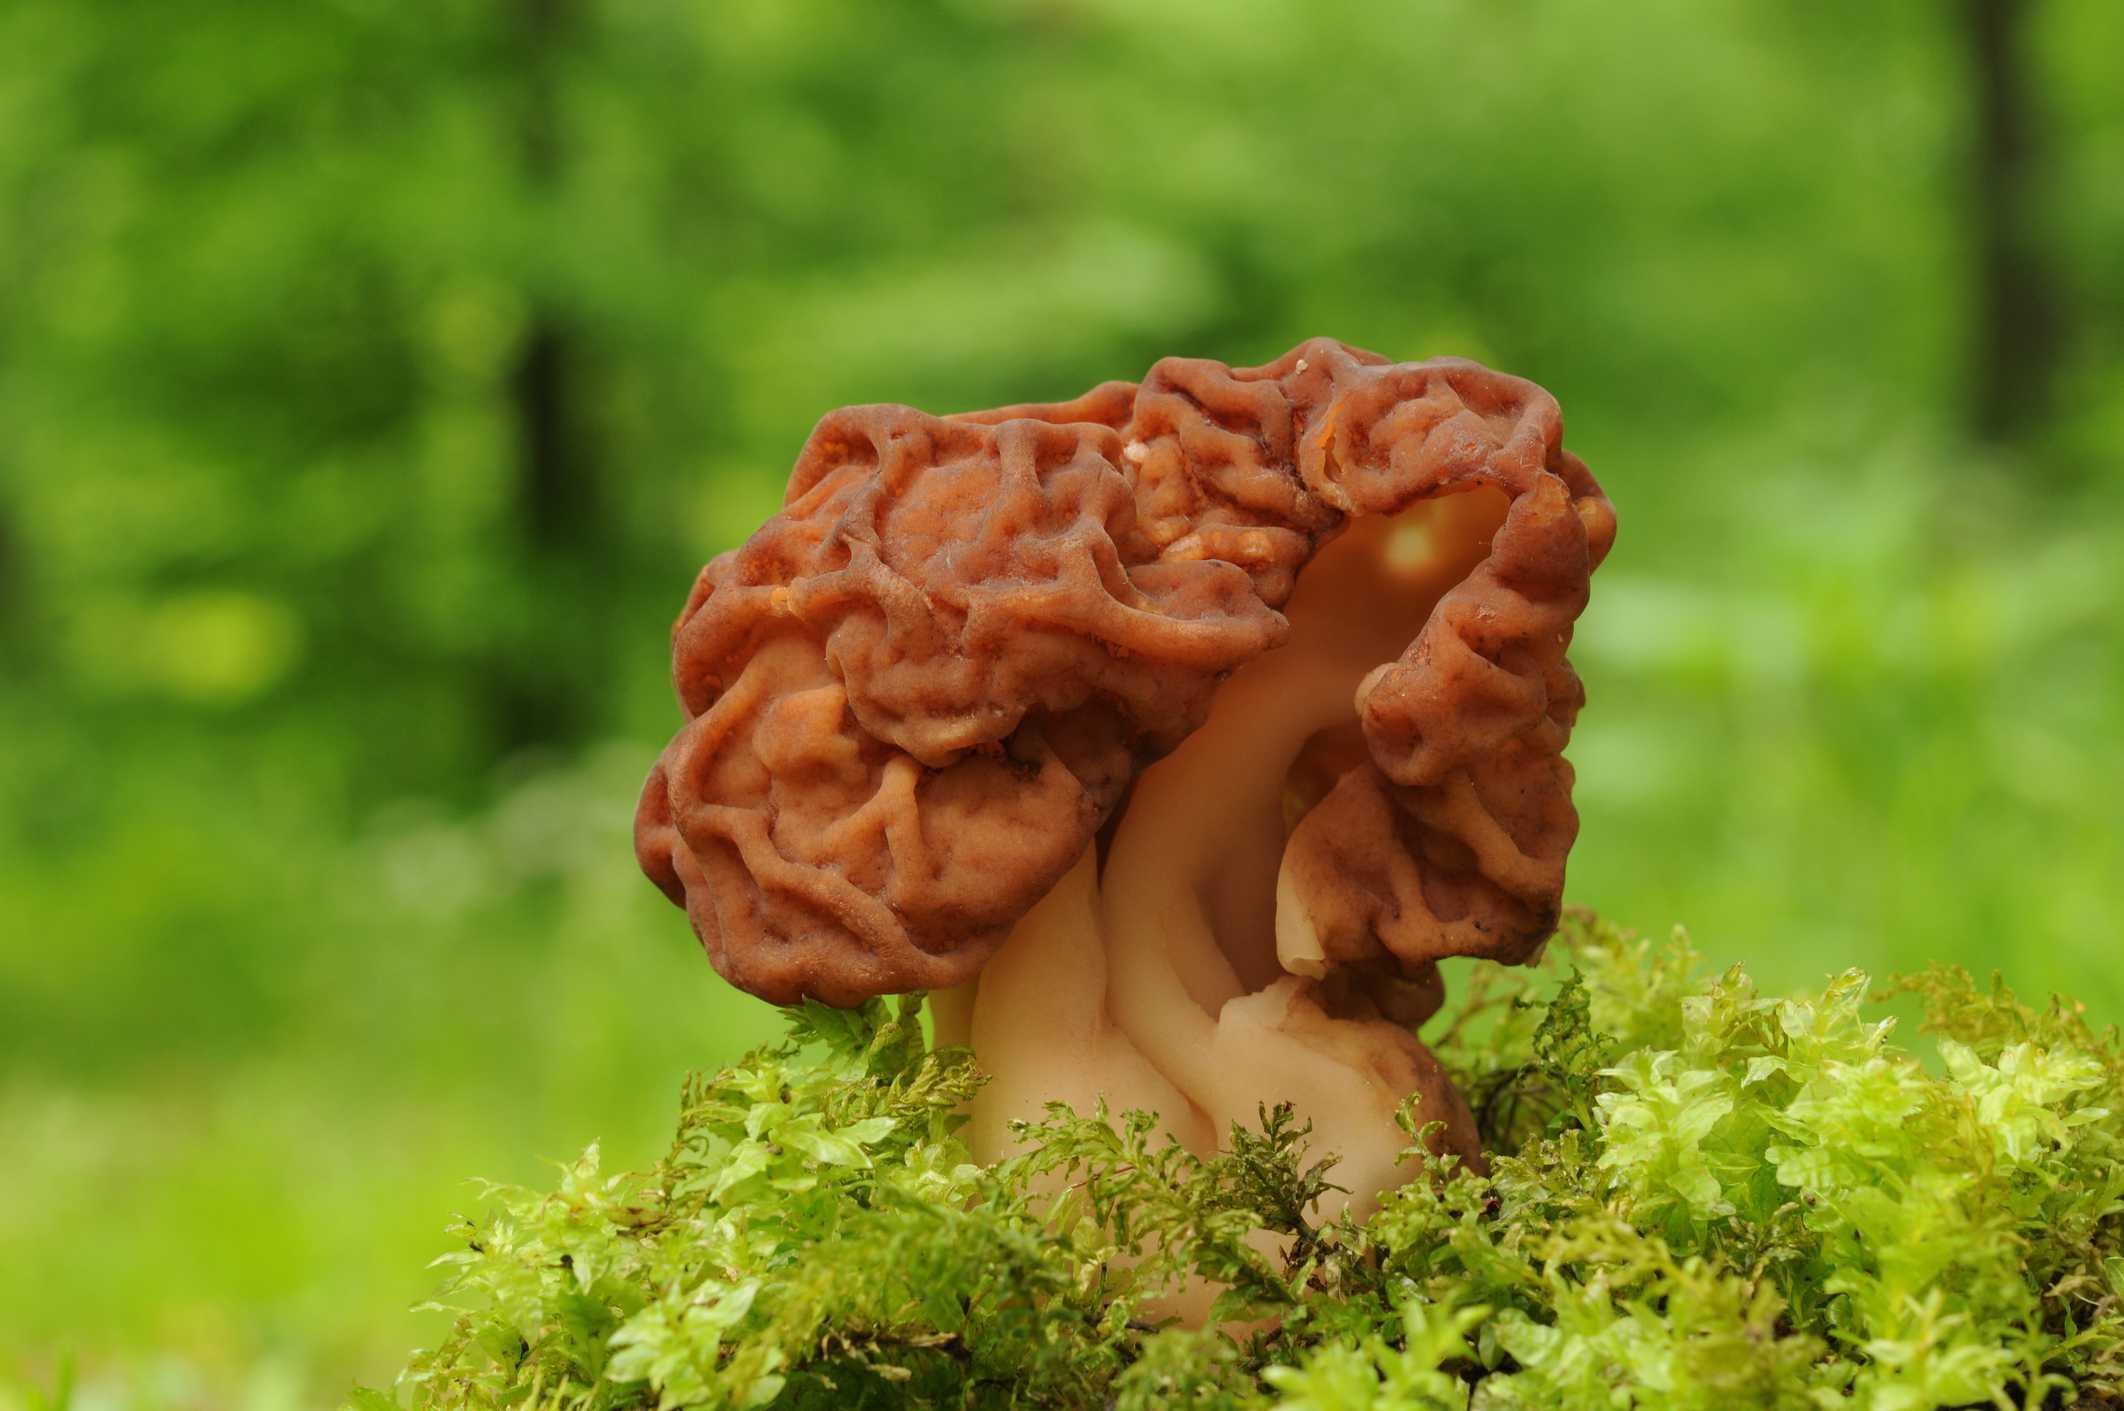 False Morel Mushroom growing in some moss